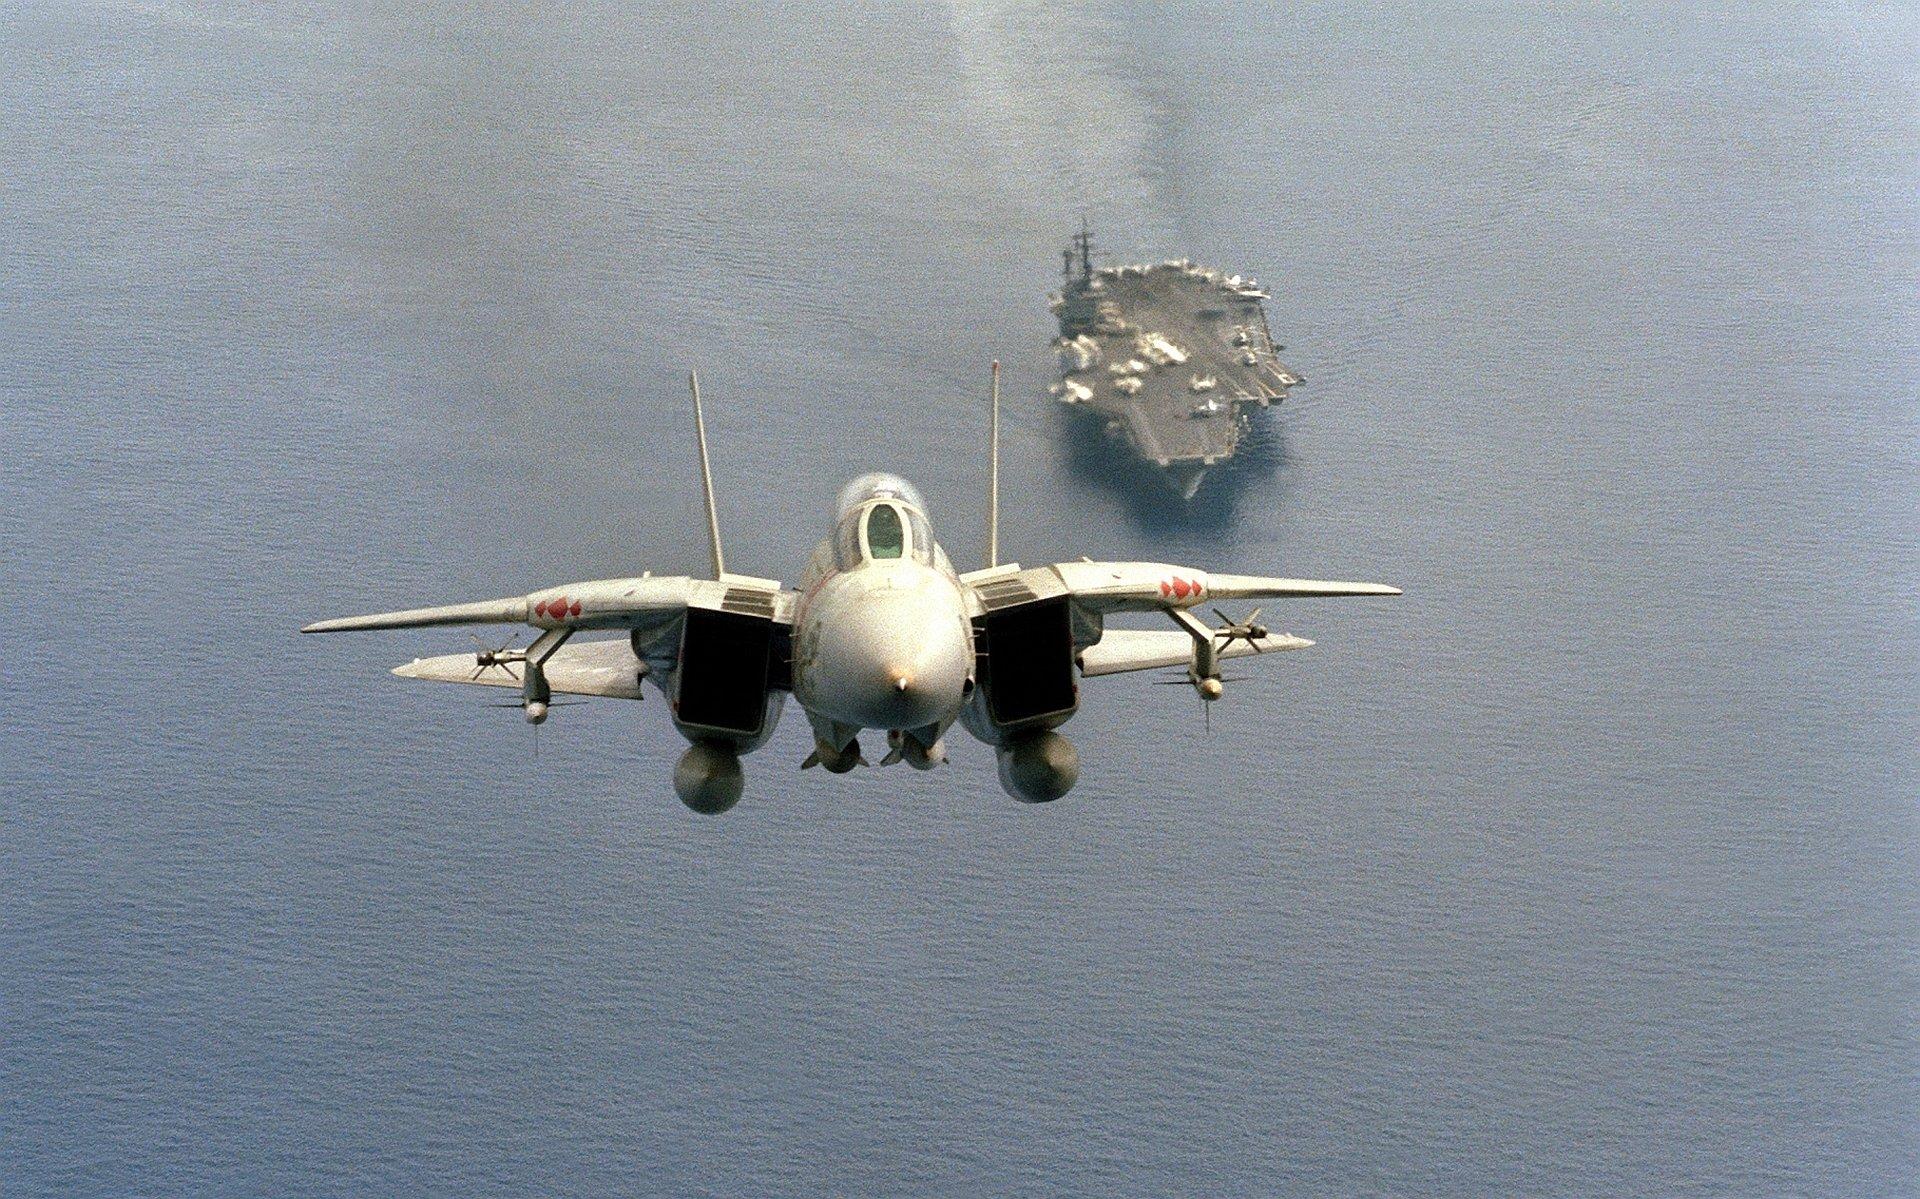 46 Grumman F 14 Tomcat Hd Wallpapers Background Images